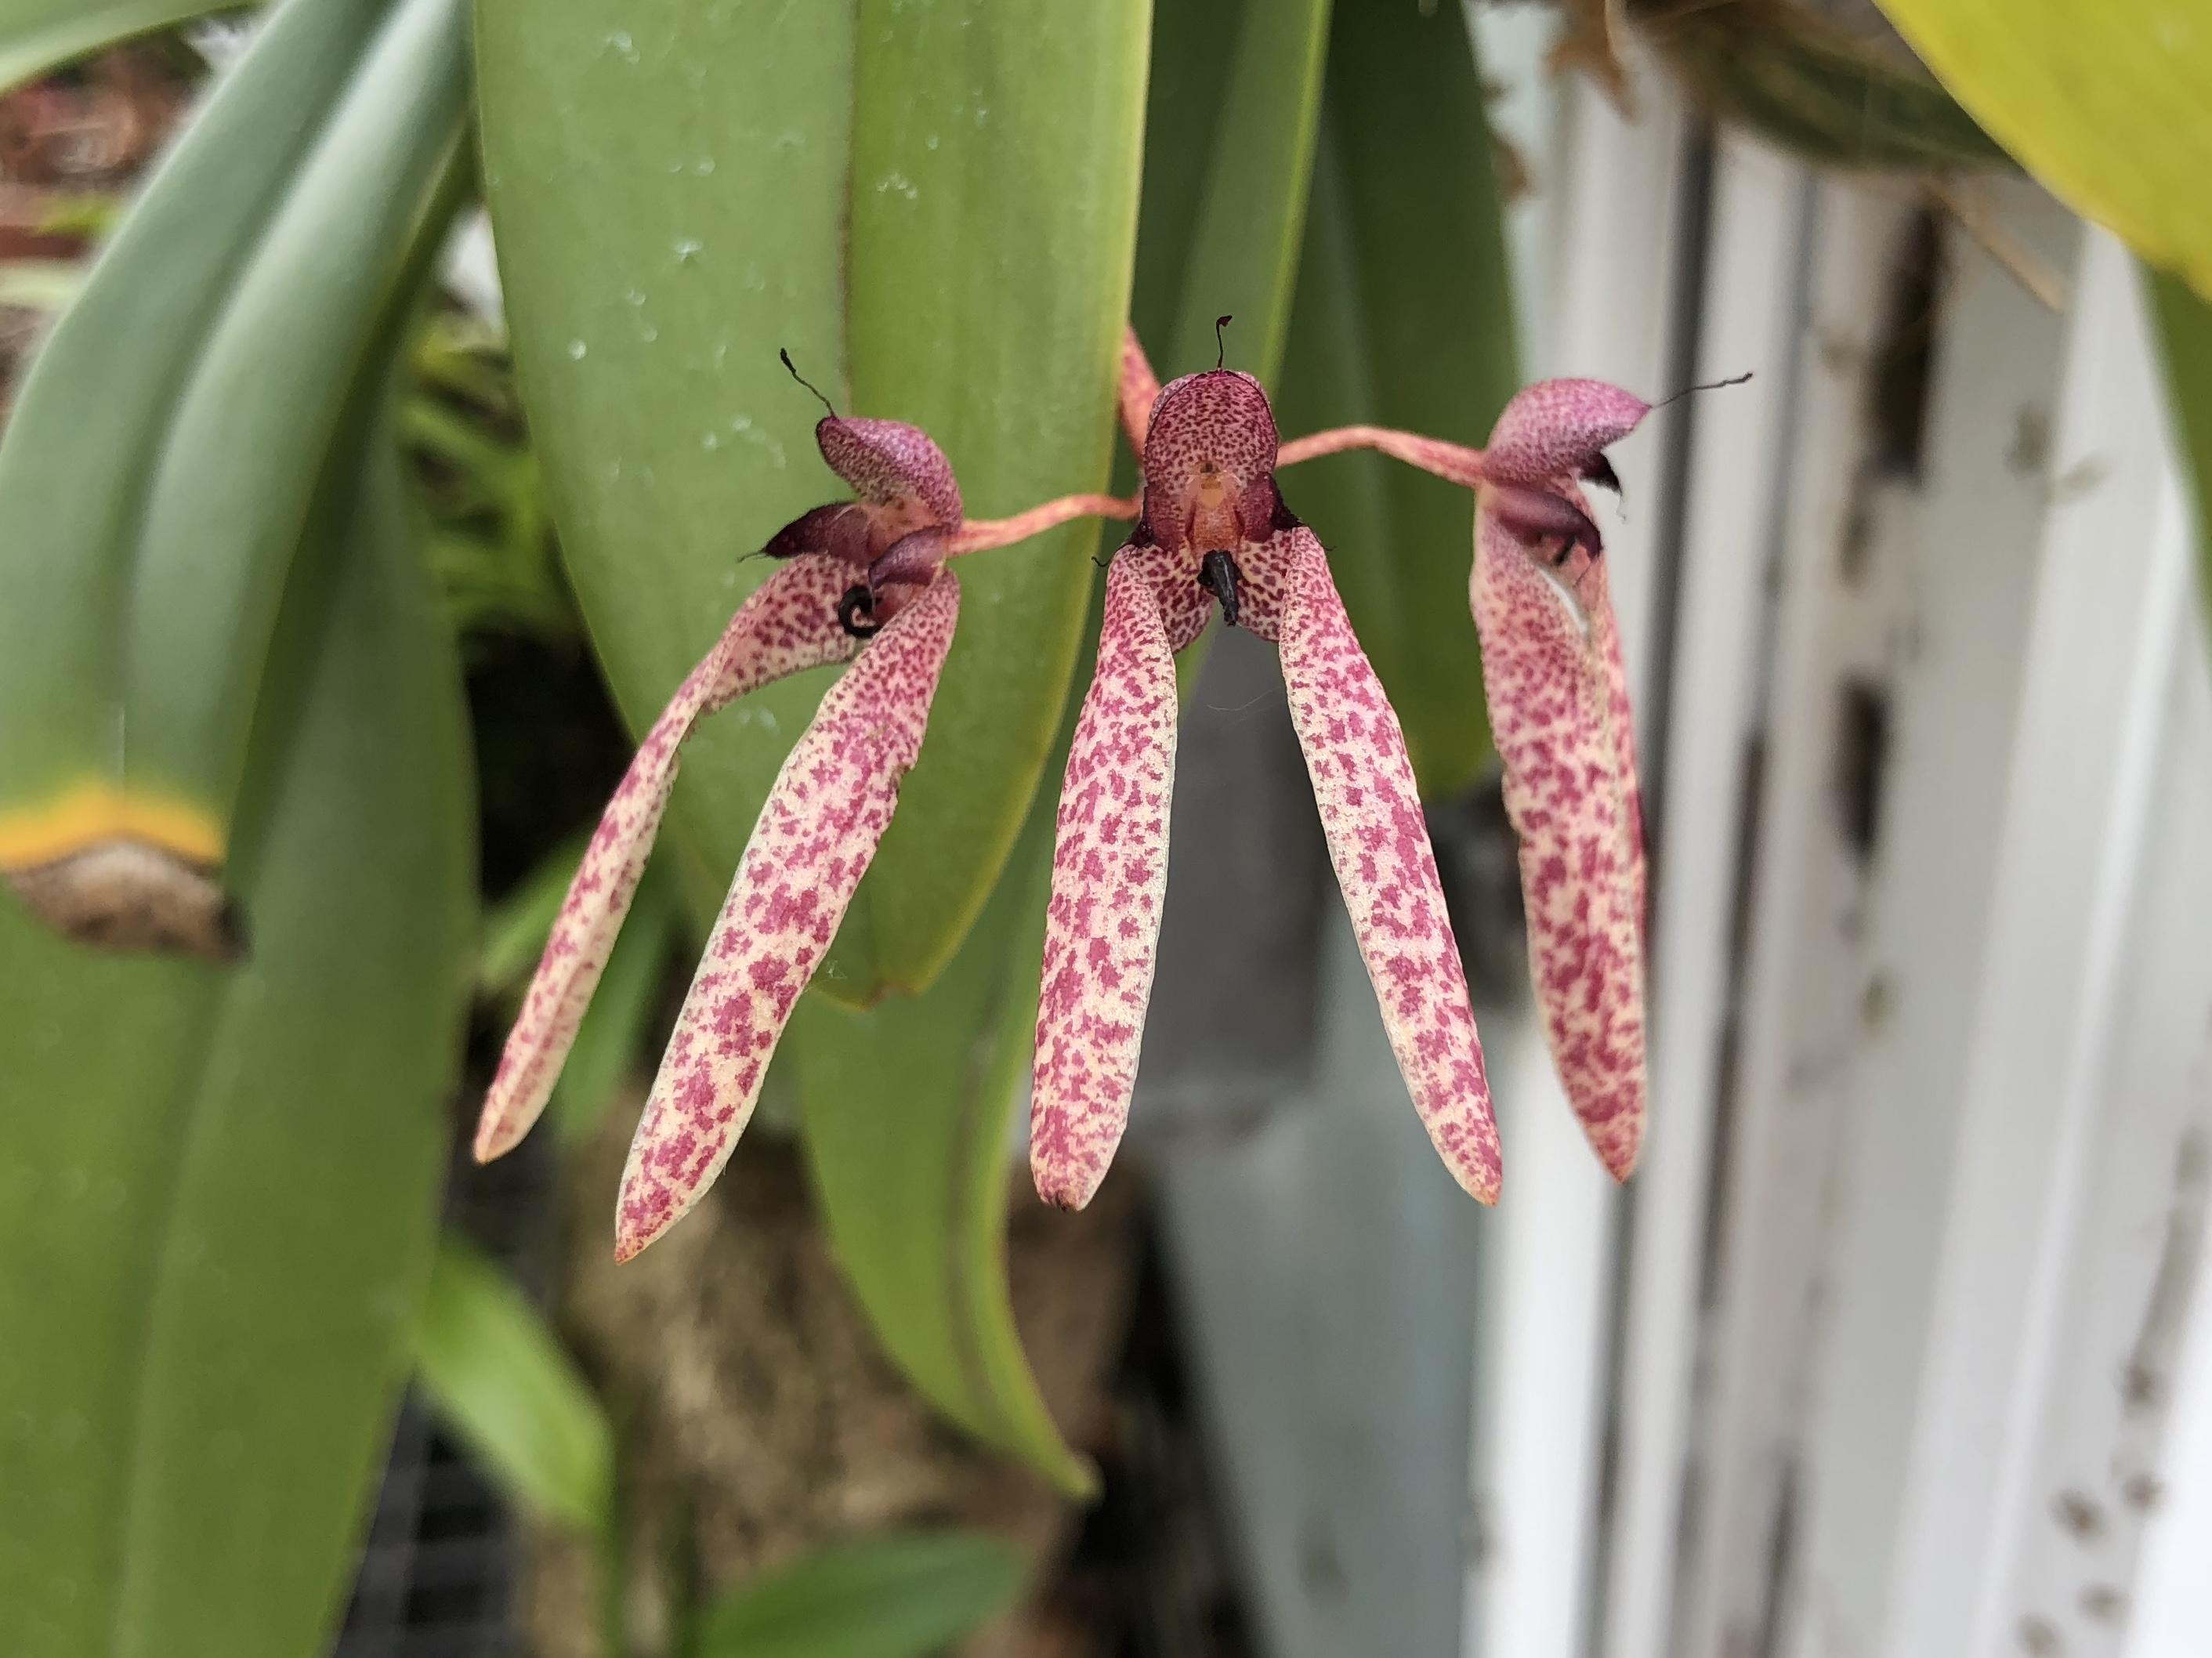 A Bulbophyllum, I believe